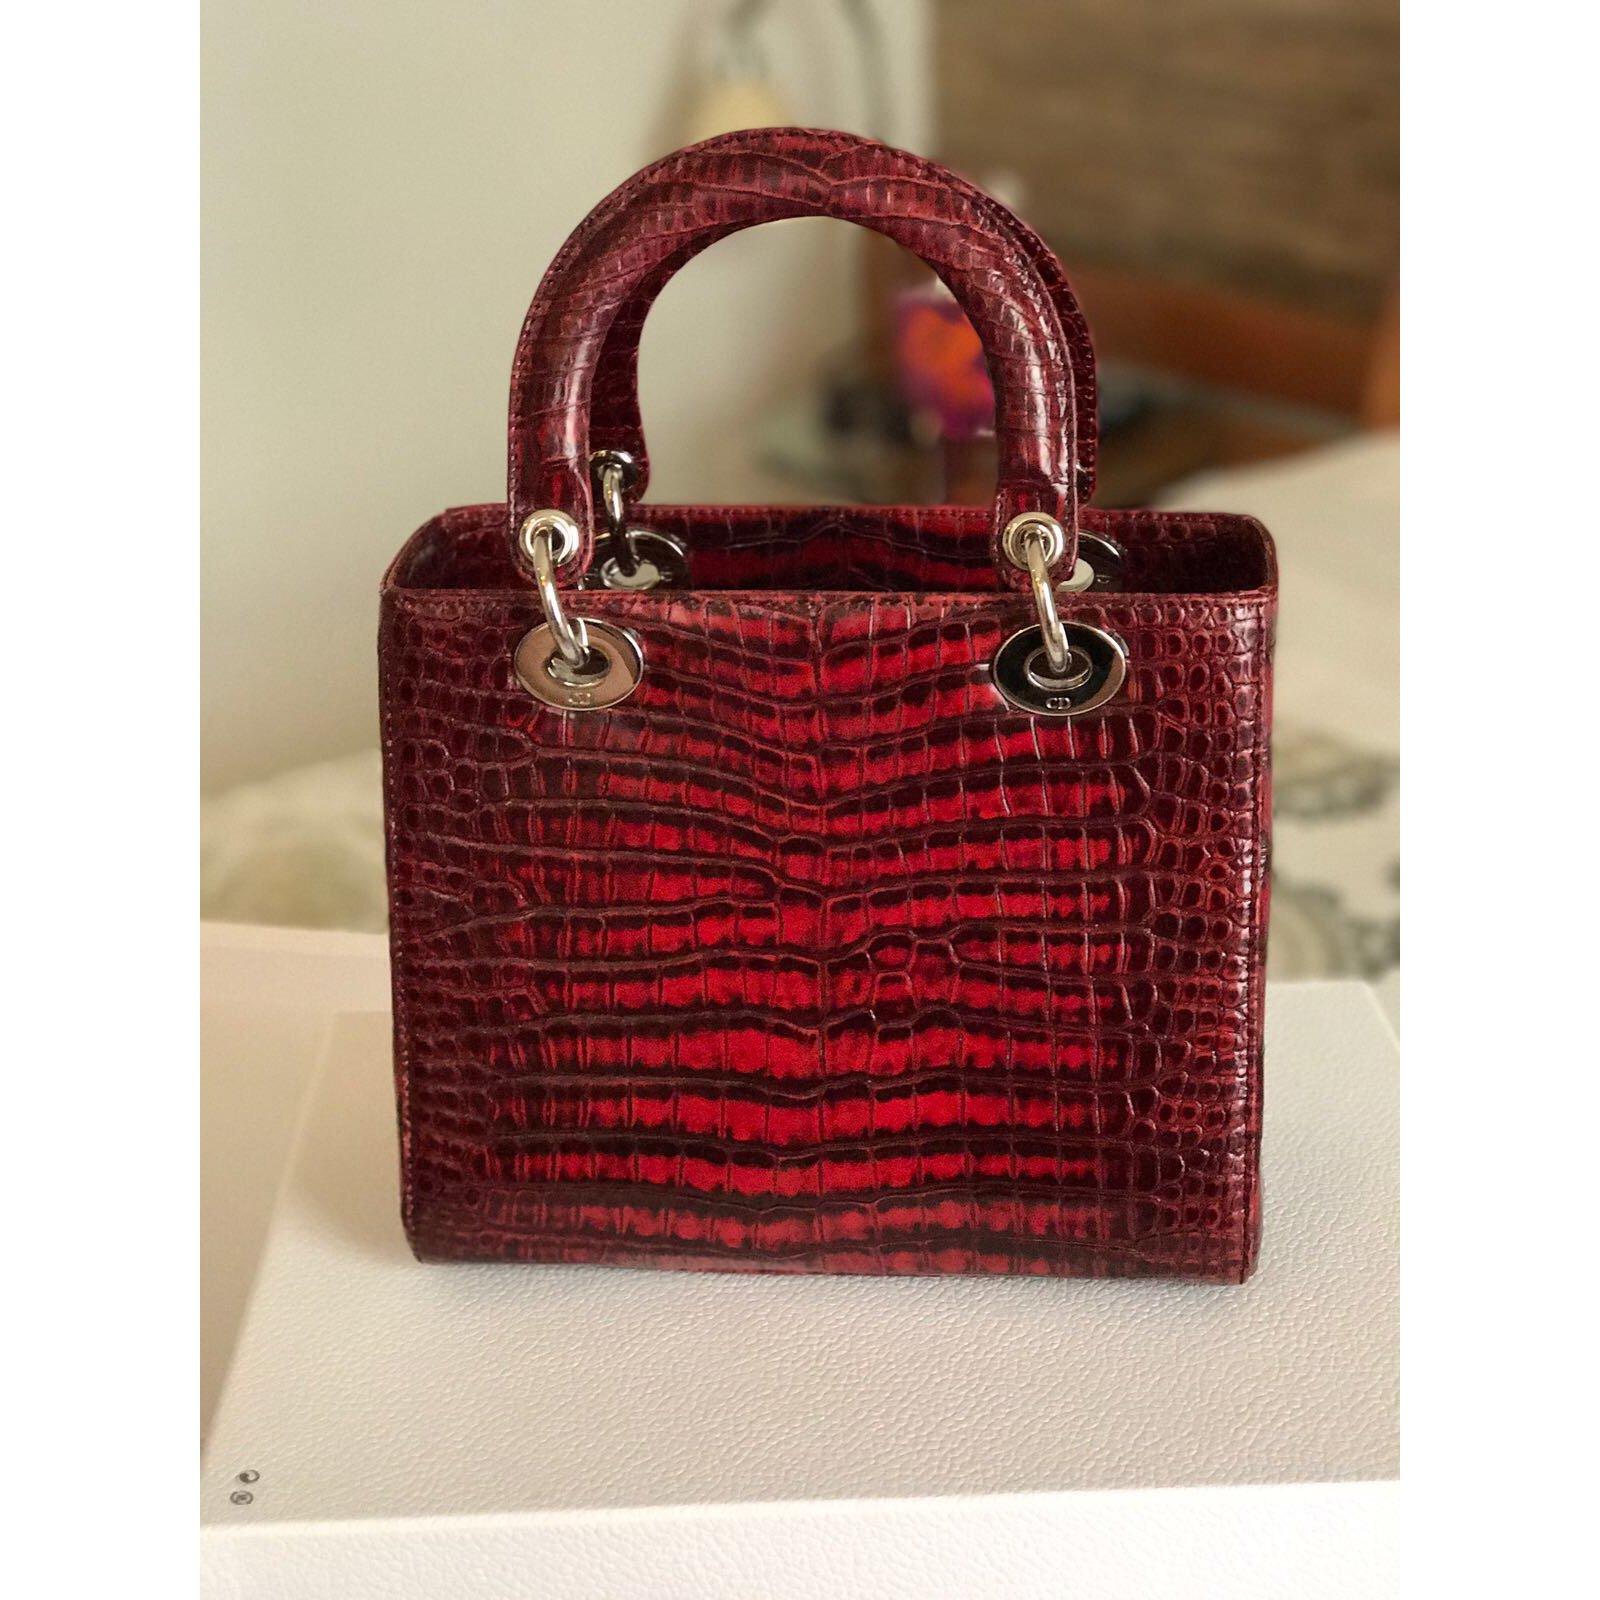 8623ed09de65 Christian Dior Lady Dior Red Crocodile Medium Handbags Exotic ...